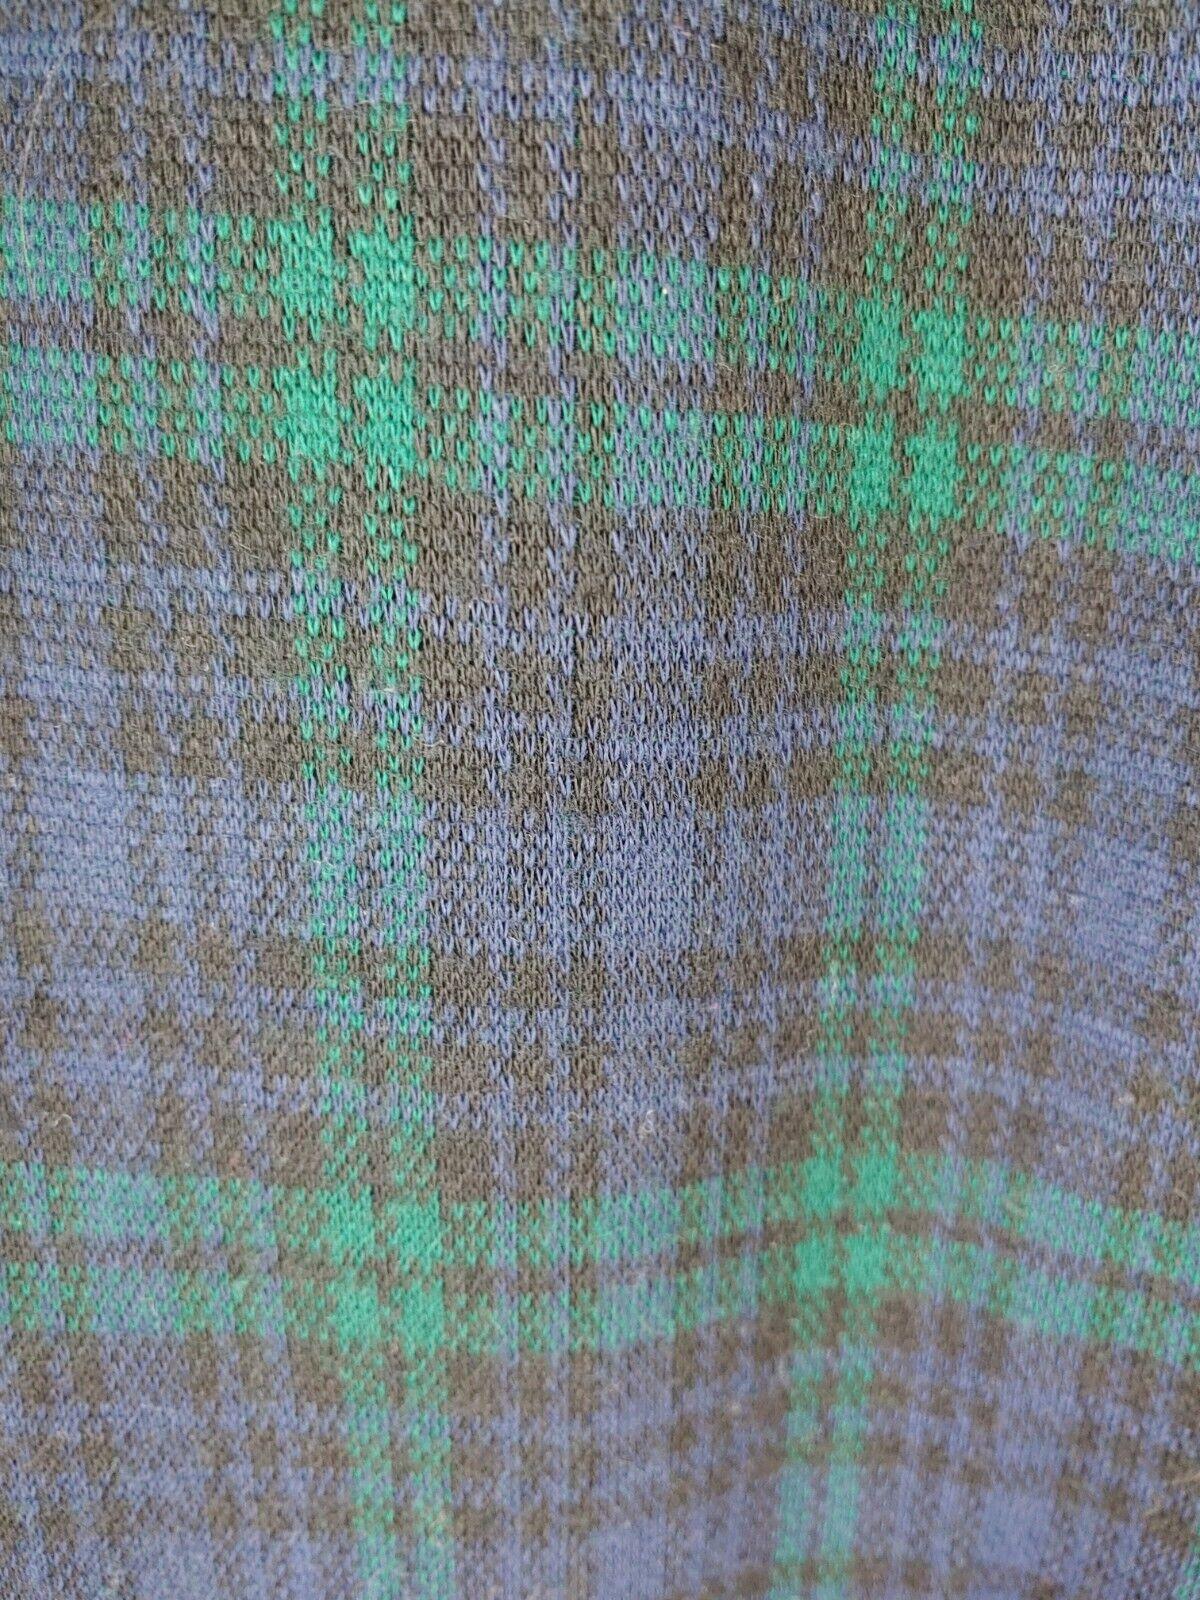 Vintage Navy & Green Plaid Knit Pants - image 3